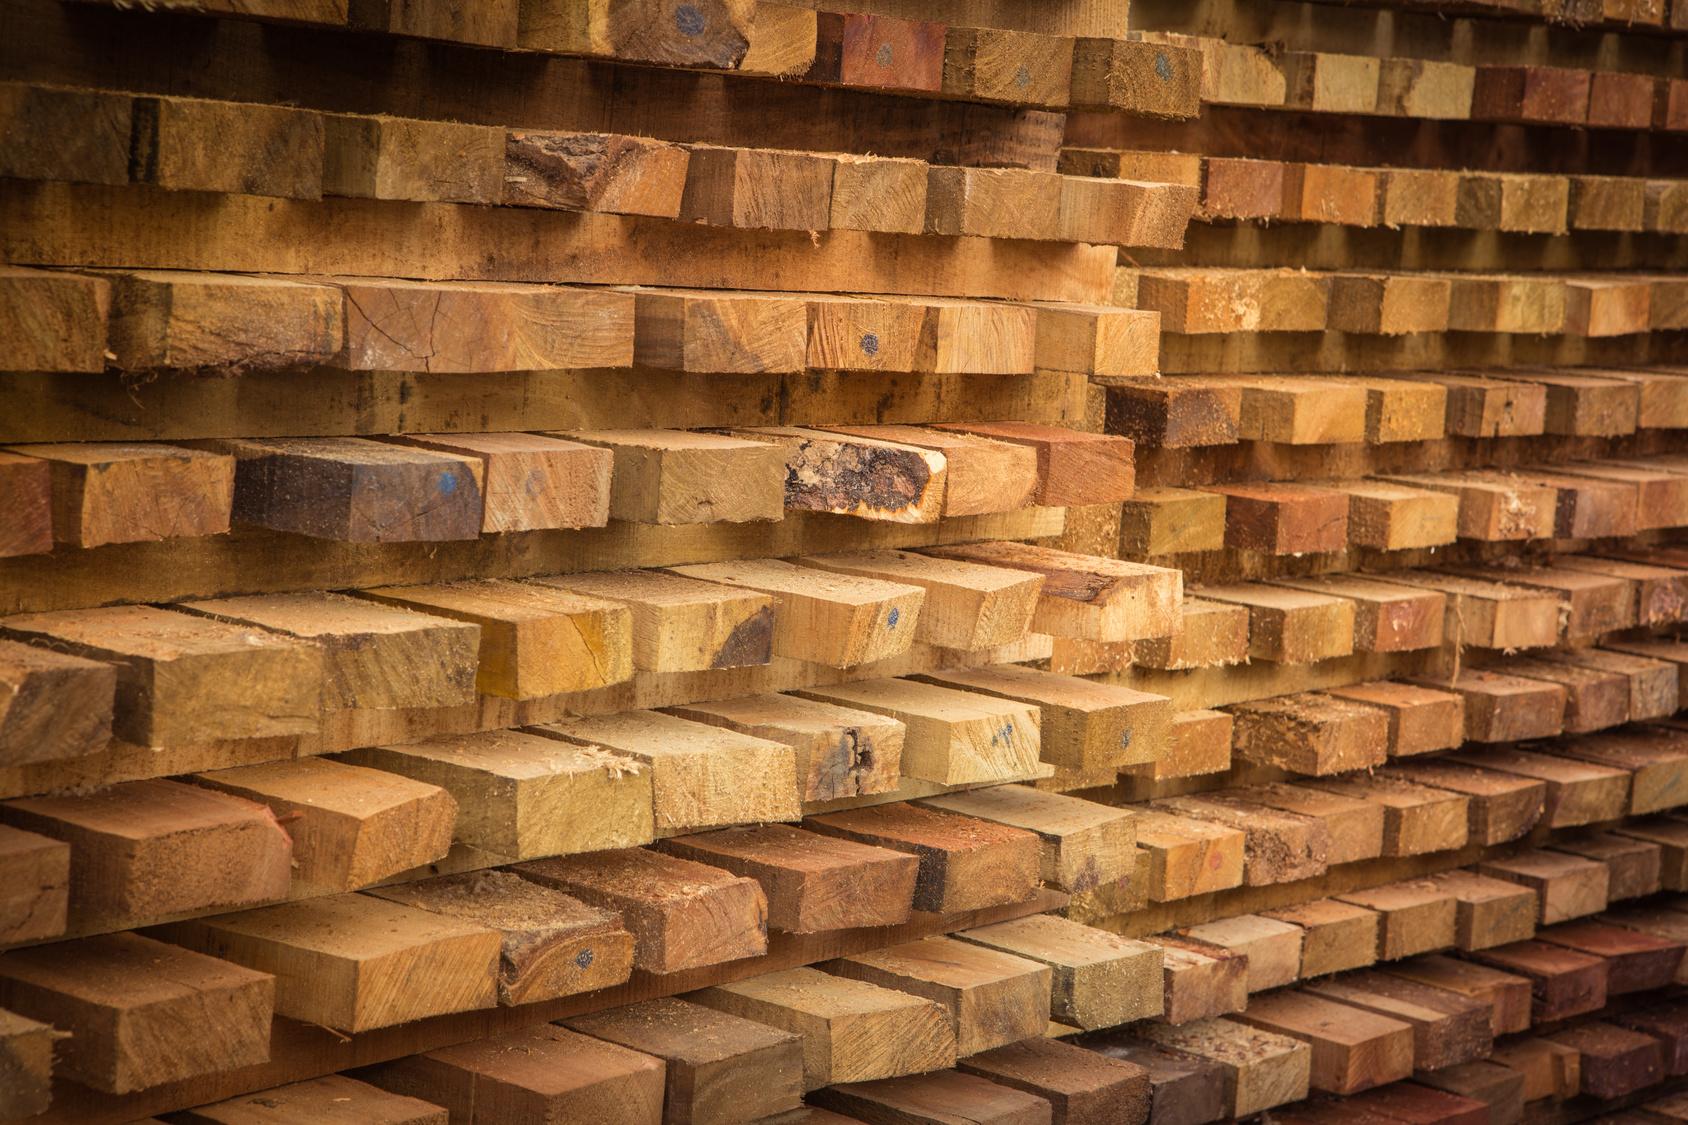 Acclimation of Wood